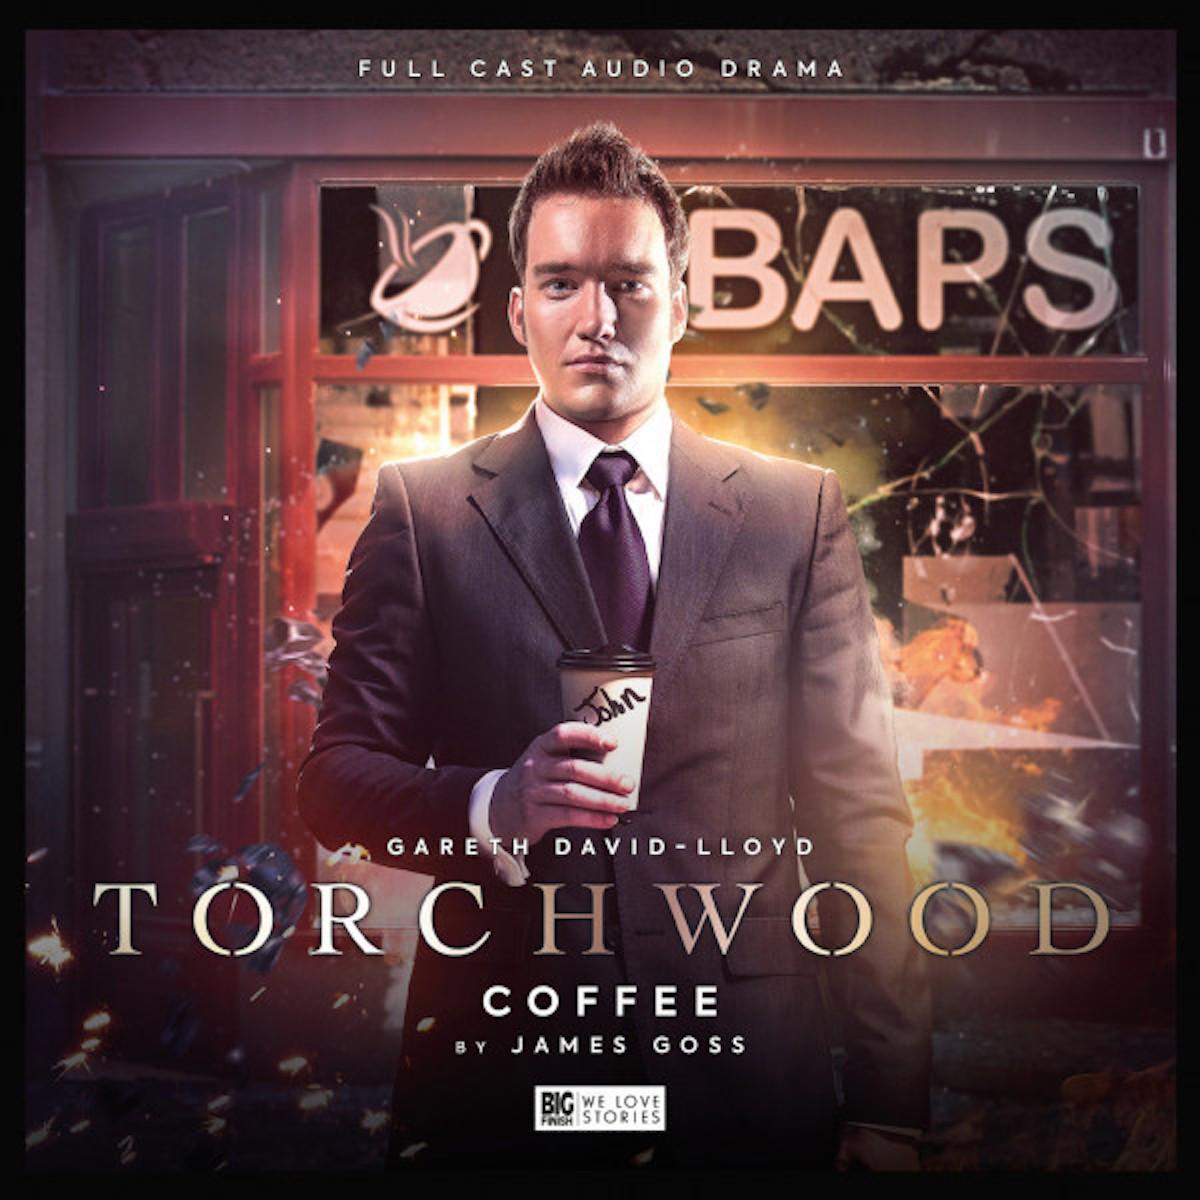 Torchwood Coffee